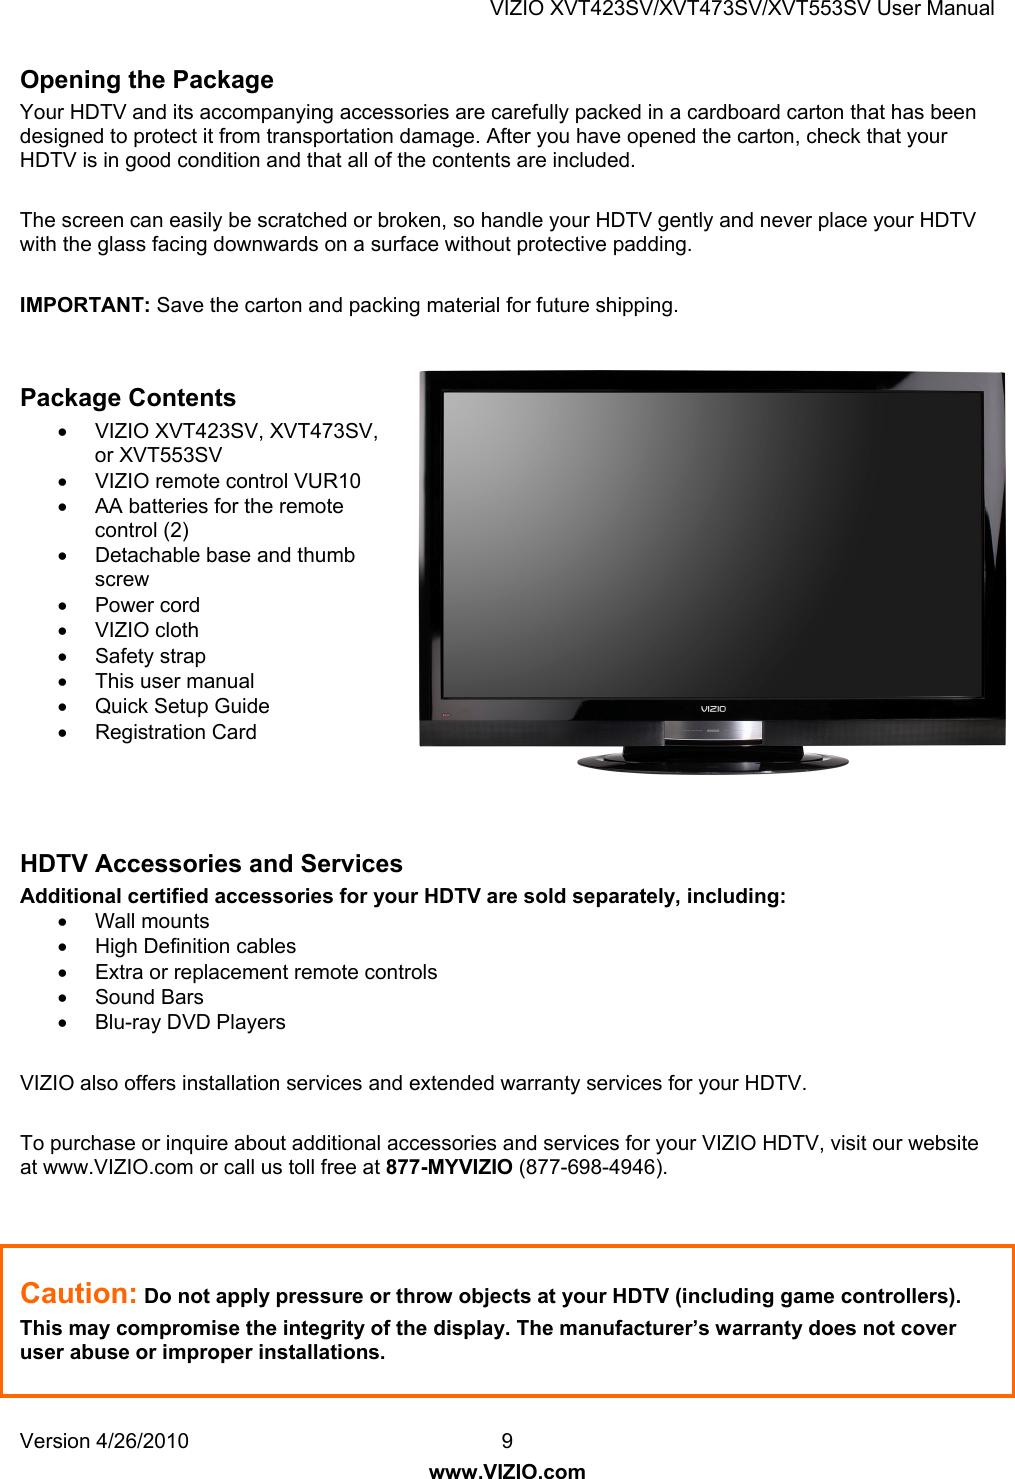 Vizio Xvt423Sv Users Manual 10 0478 XVT423 473 553SV_